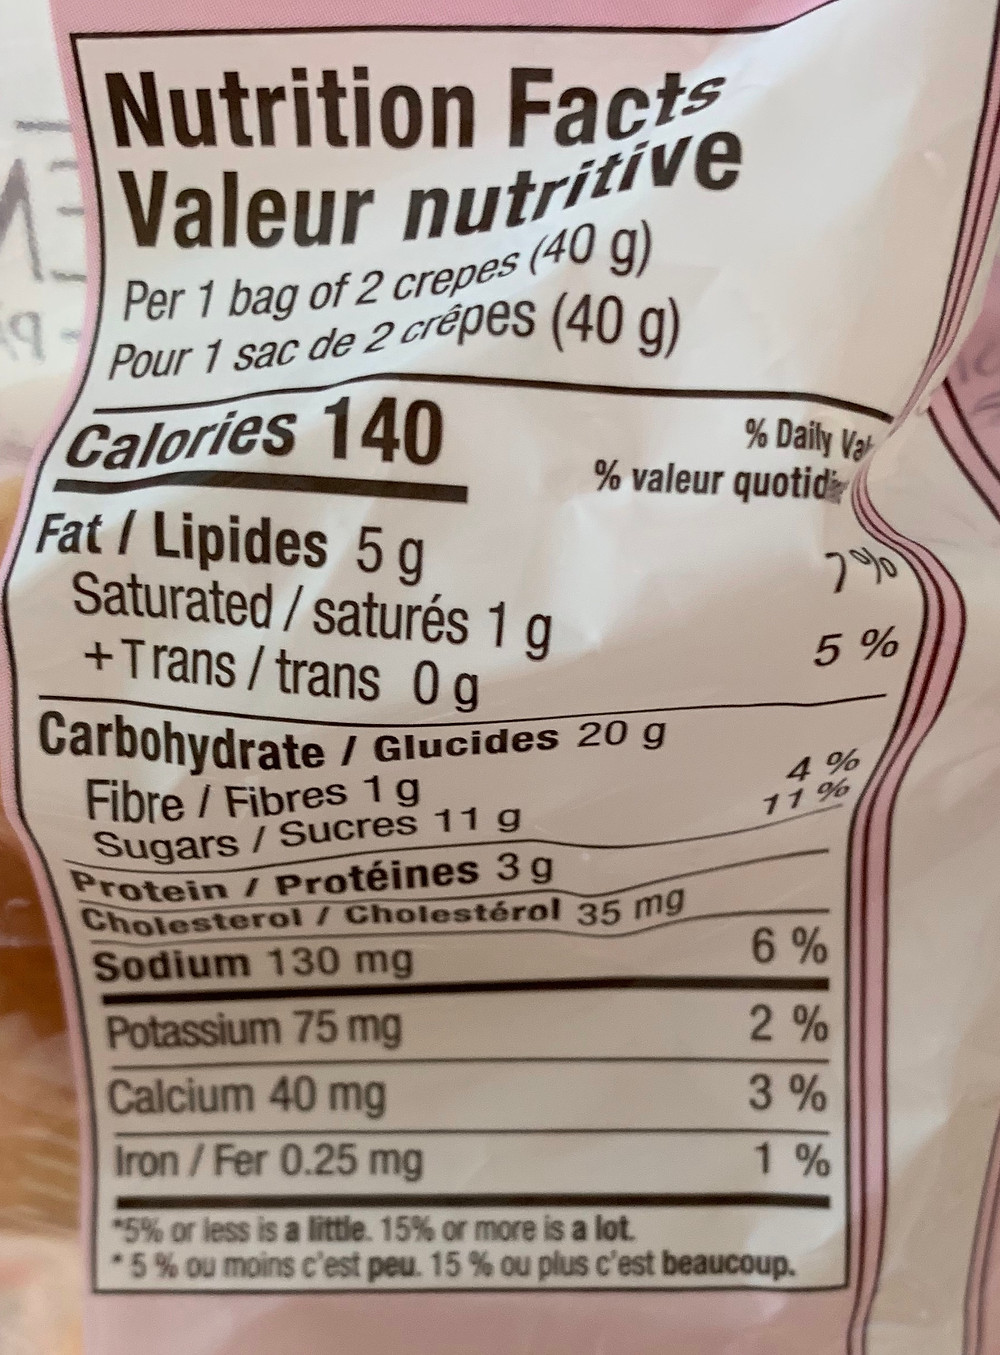 Costco LeMarie Patissier Mini Crepes Nutrition